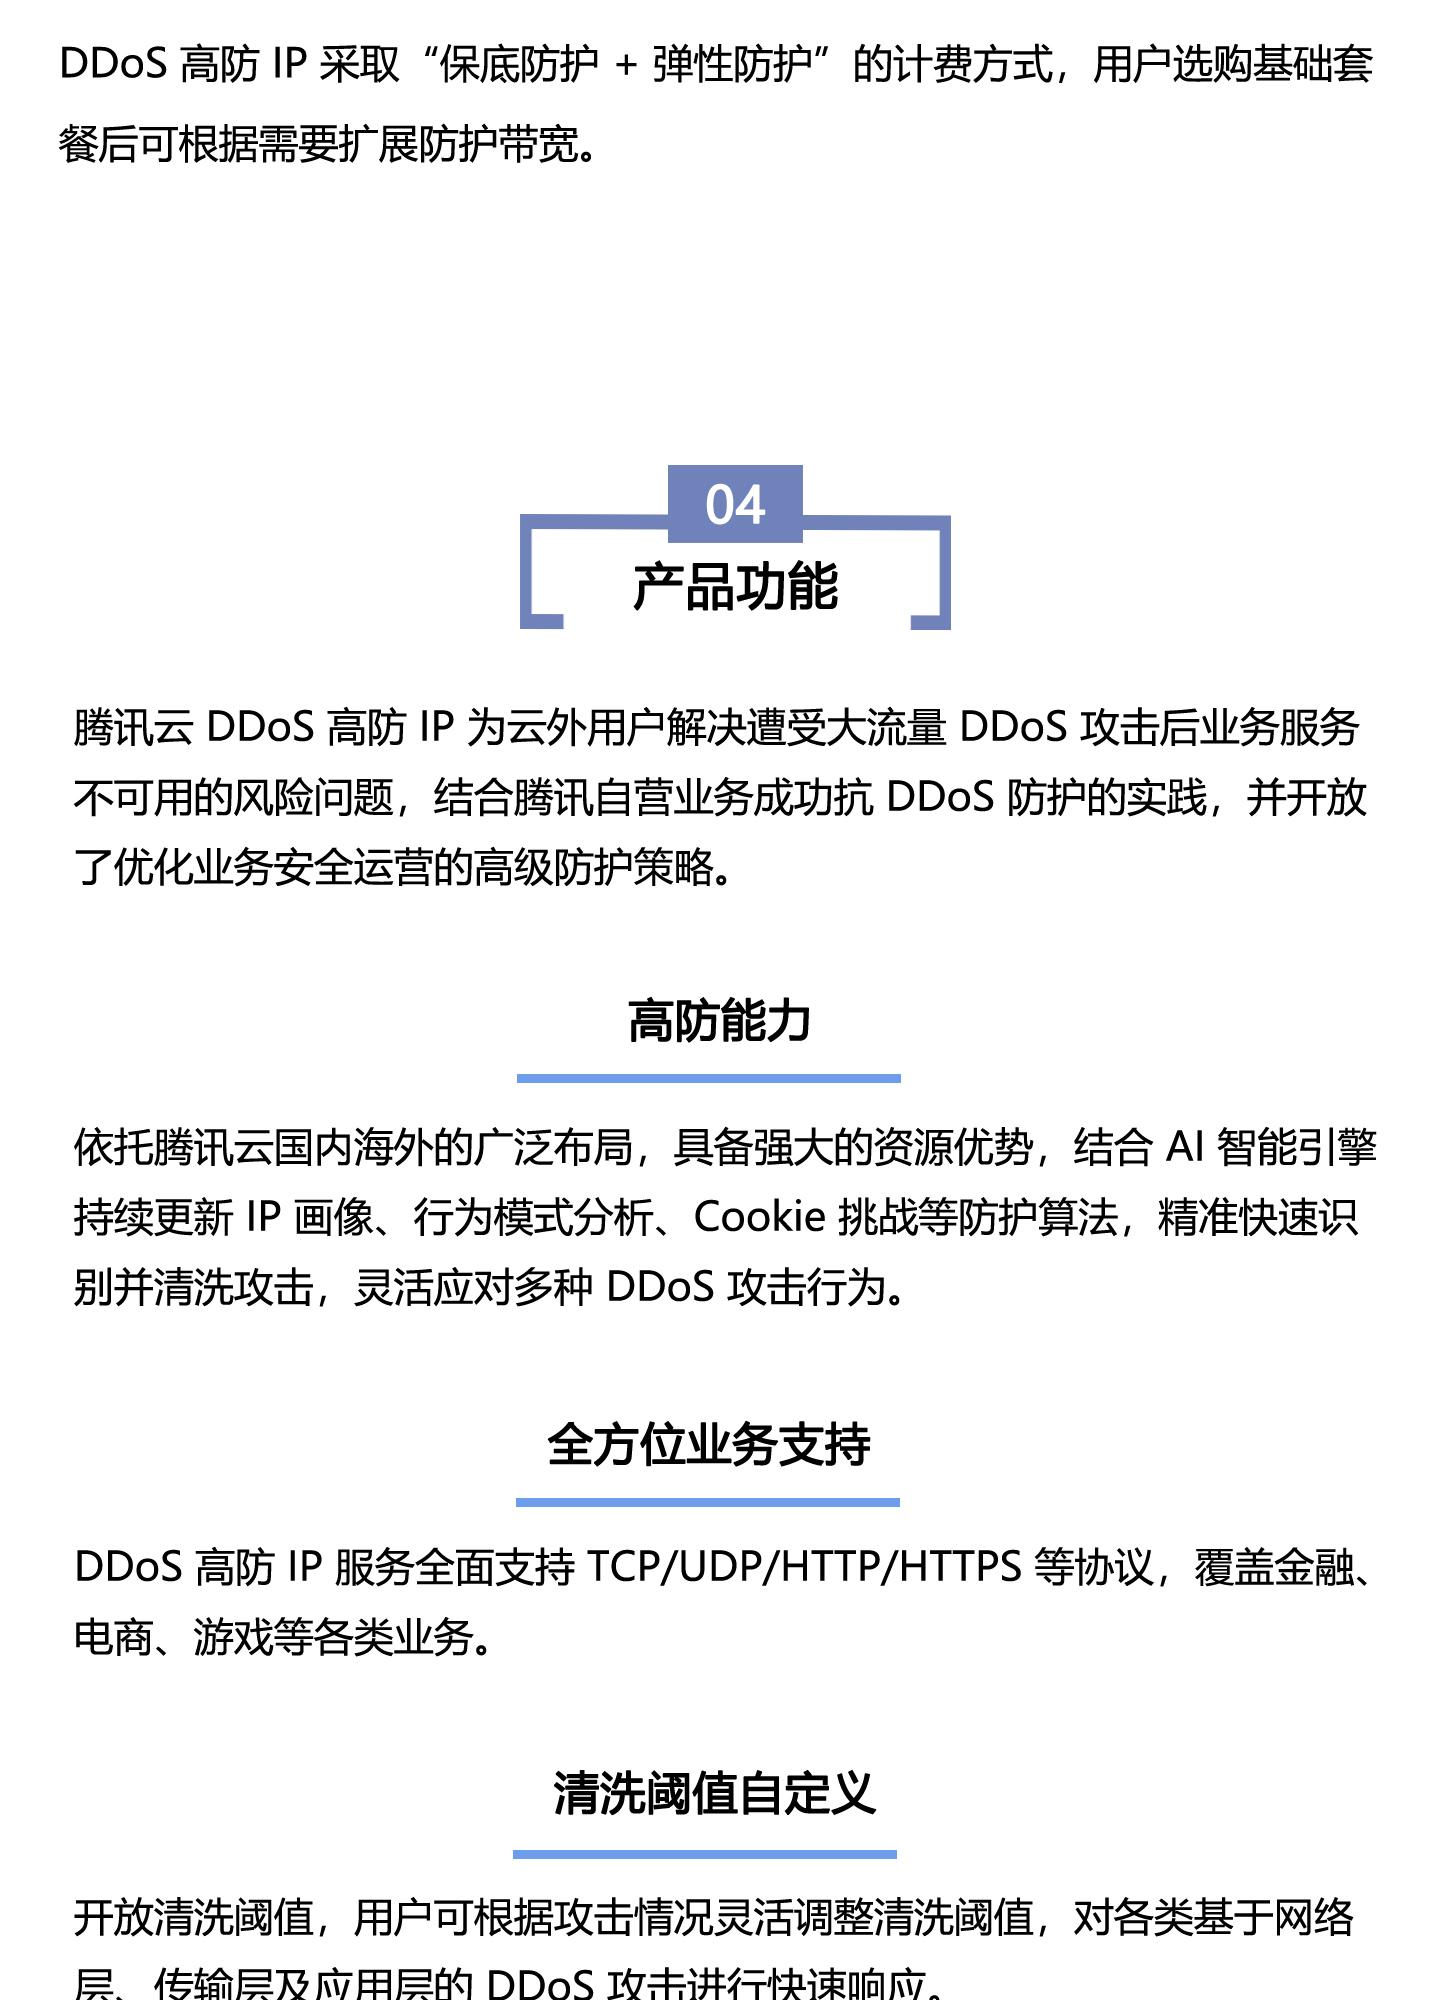 T-Sec-DDoS-高防-IP1440_05.jpg